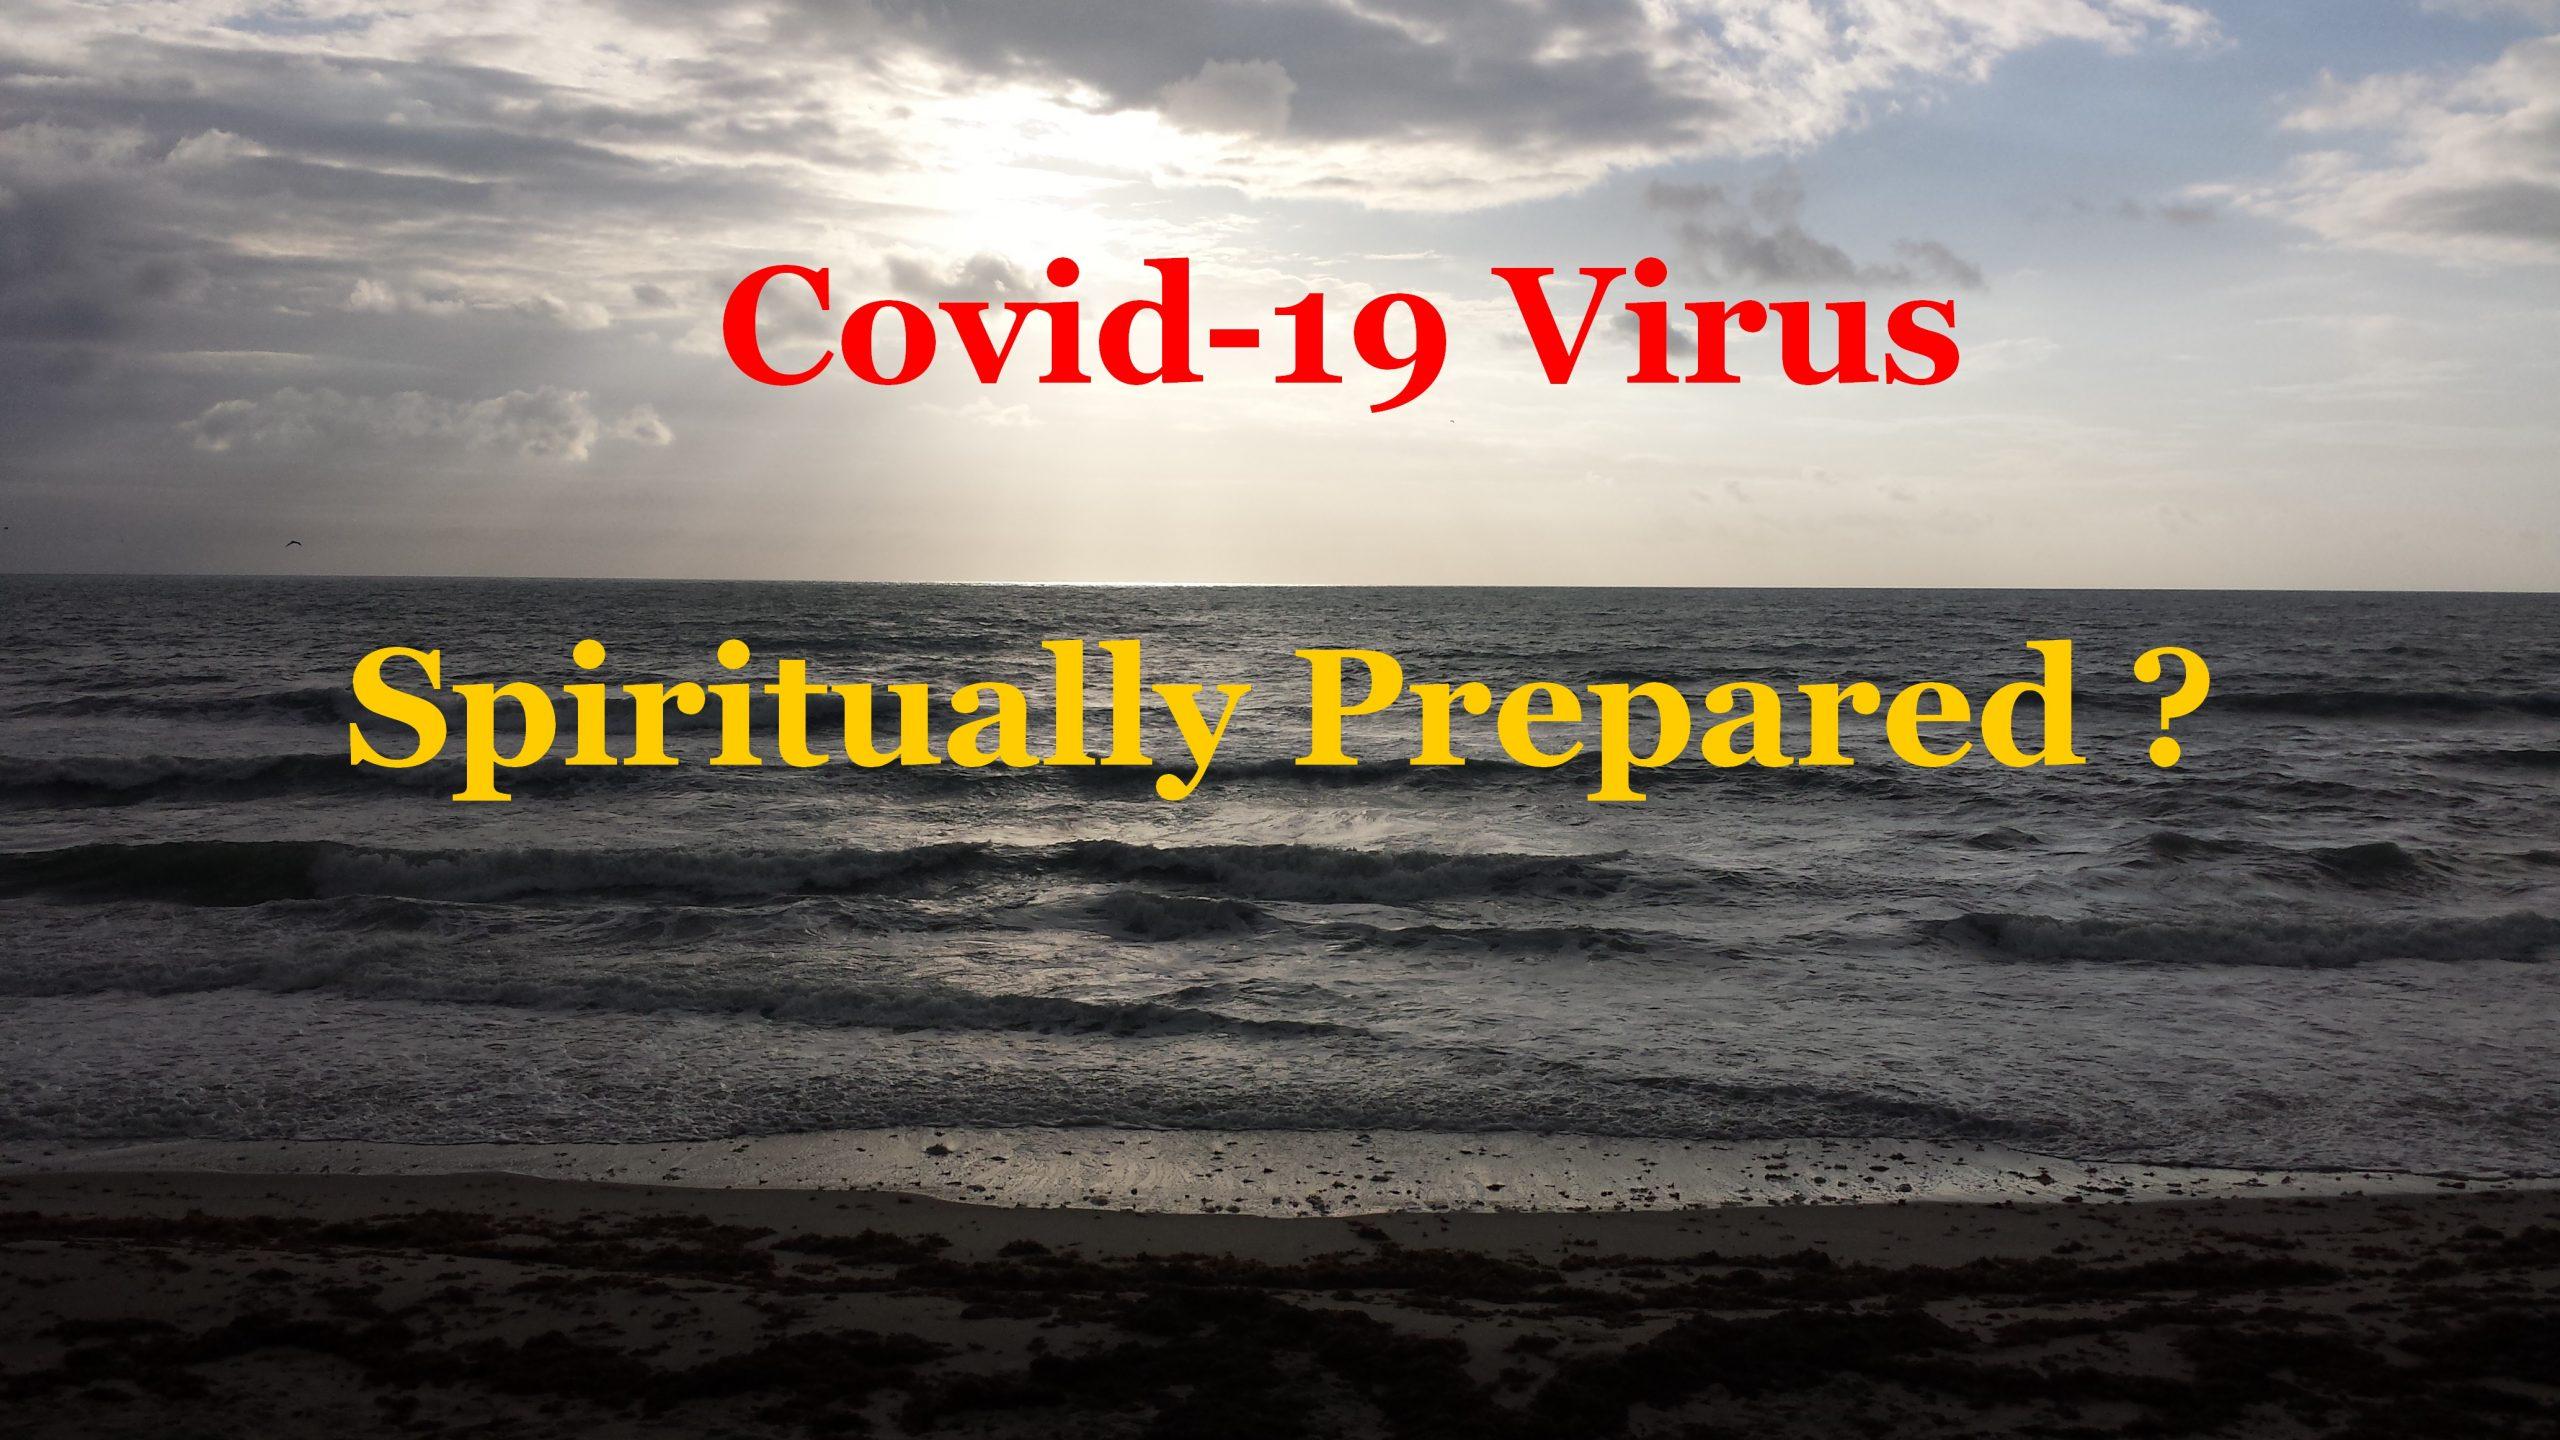 Covid-19 and Spiritual Life